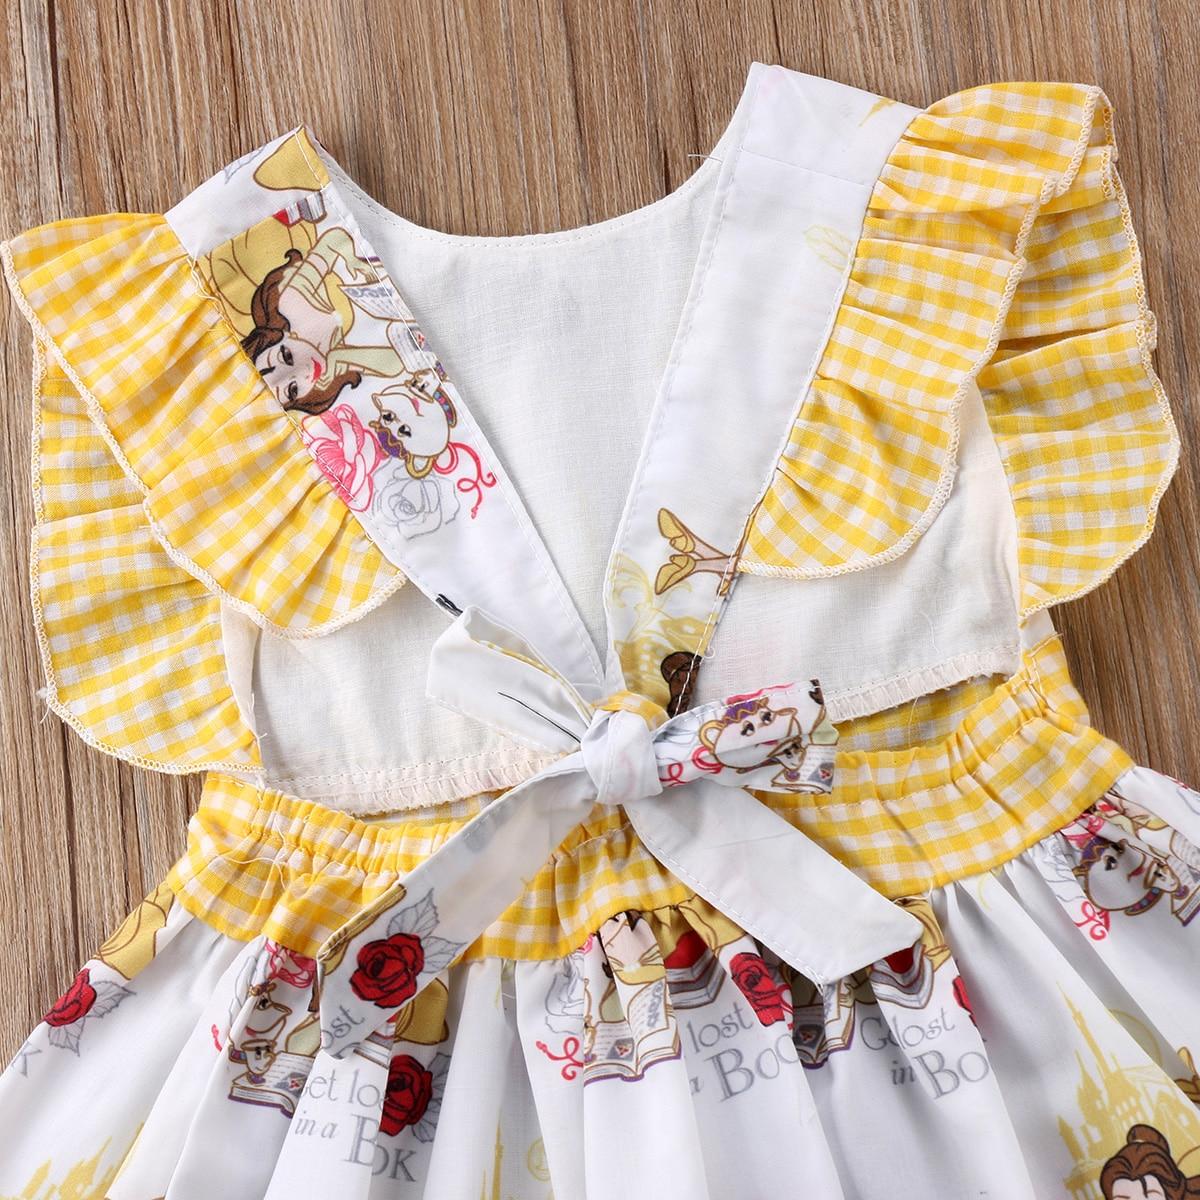 e56b4051d015f US $4.82 10% OFF|Baby Girls Toddler Cartoon Ruffles Dress Kids Bowknot  Princess Party Tutu Mini Dress-in Dresses from Mother & Kids on  Aliexpress.com ...